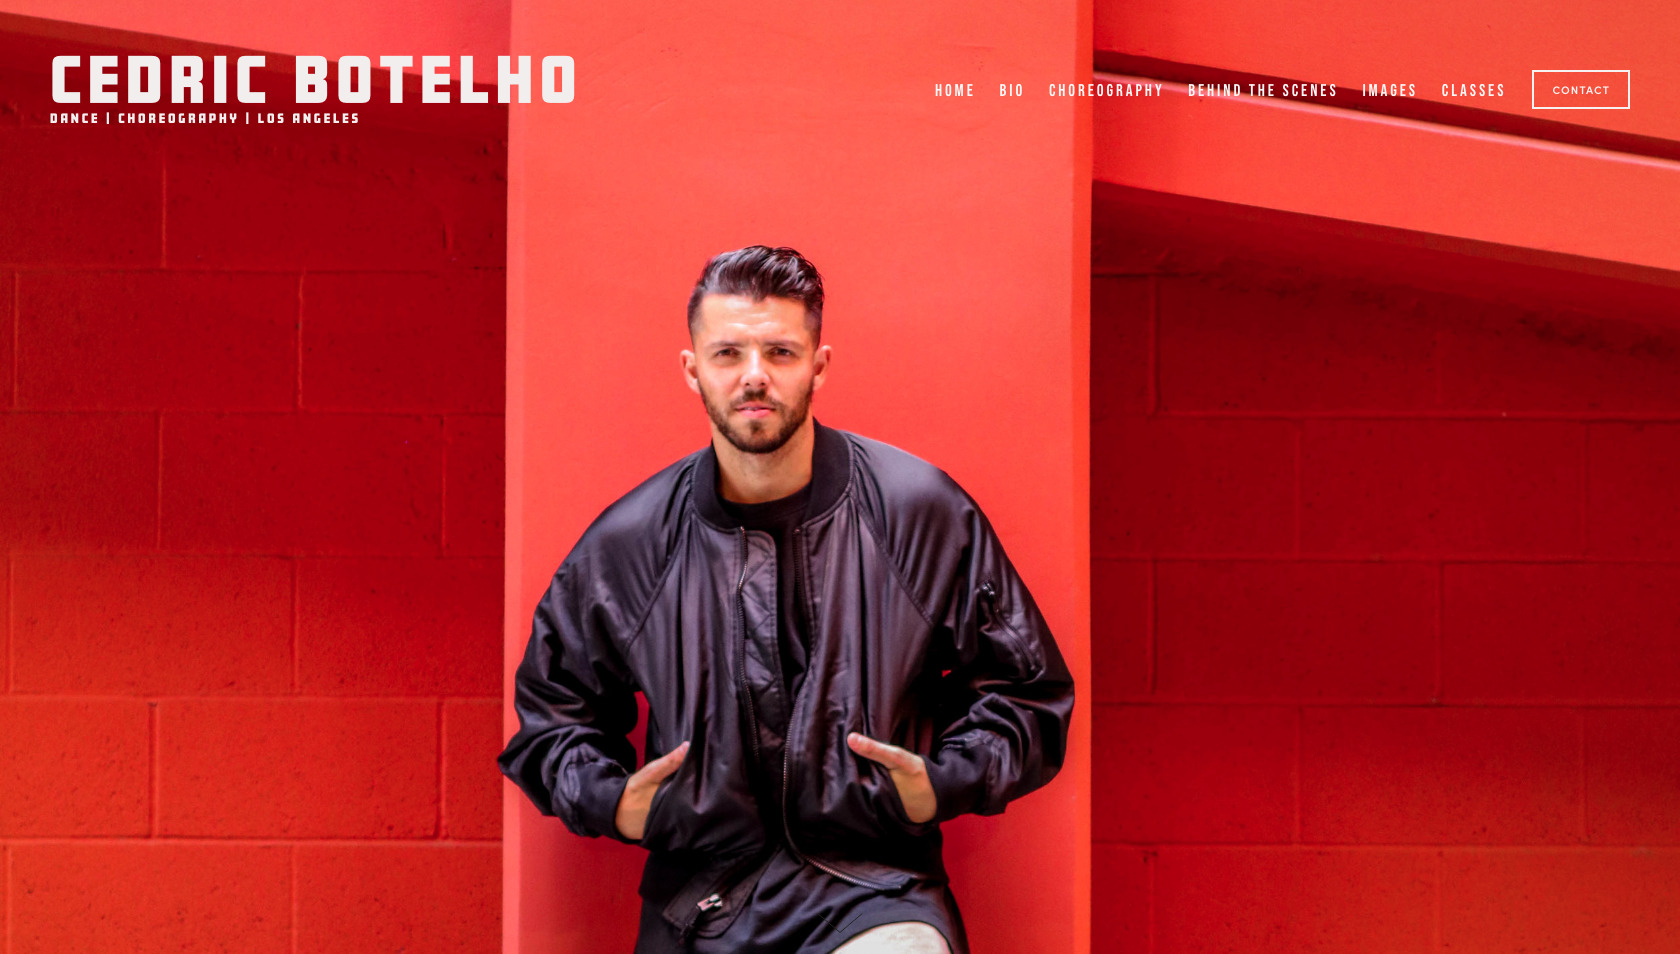 Screenshot_2019-05-21 Cedric Botelho - Los Angeles Choreographer Dancer — Cedric Botelho(2).jpg